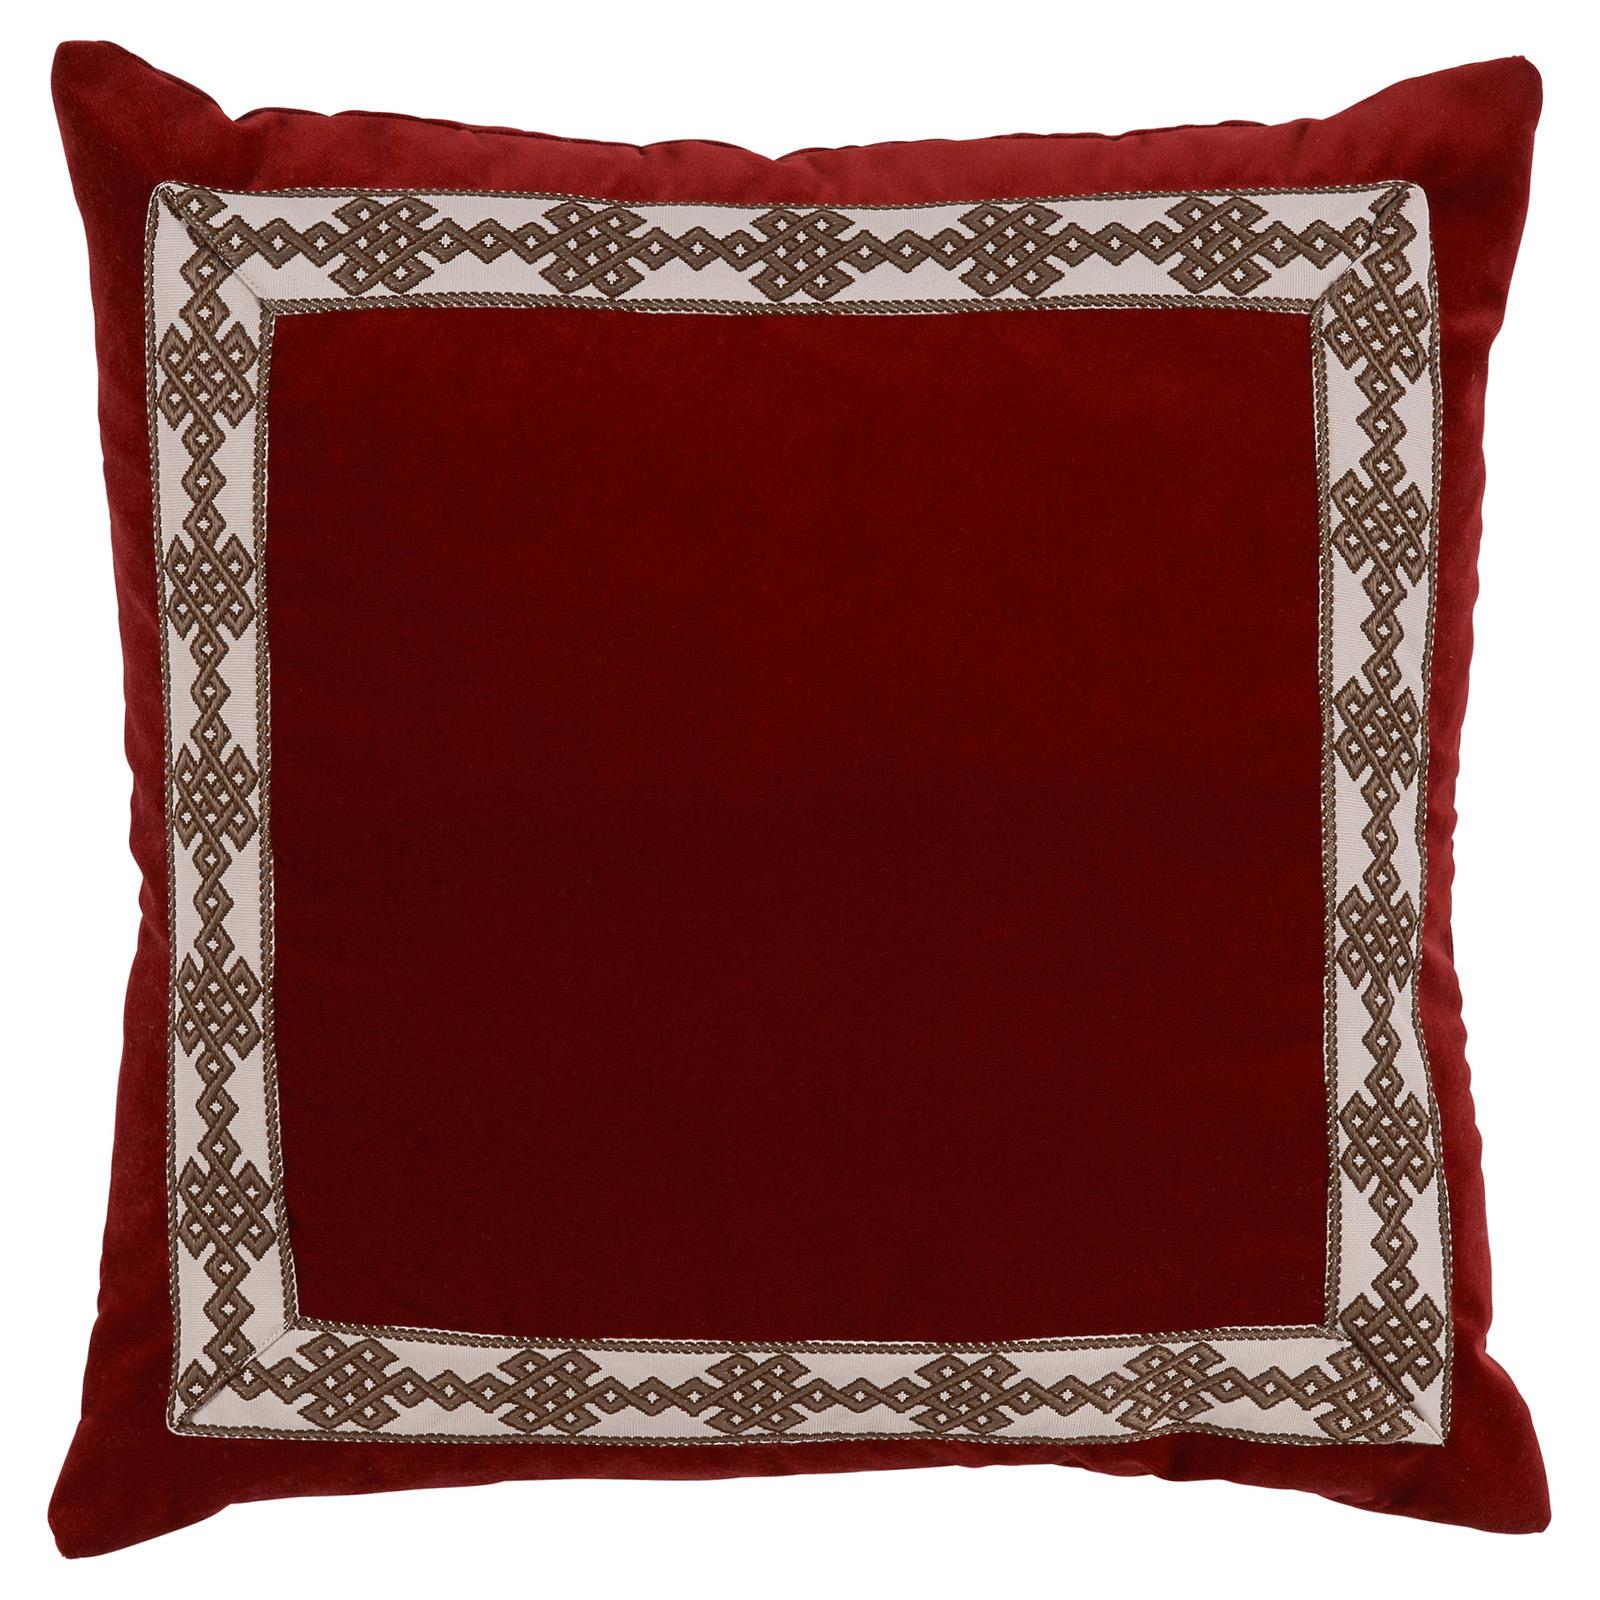 Aida Global Modern Ruby Trellis Trim Velvet Pillow - 22x22